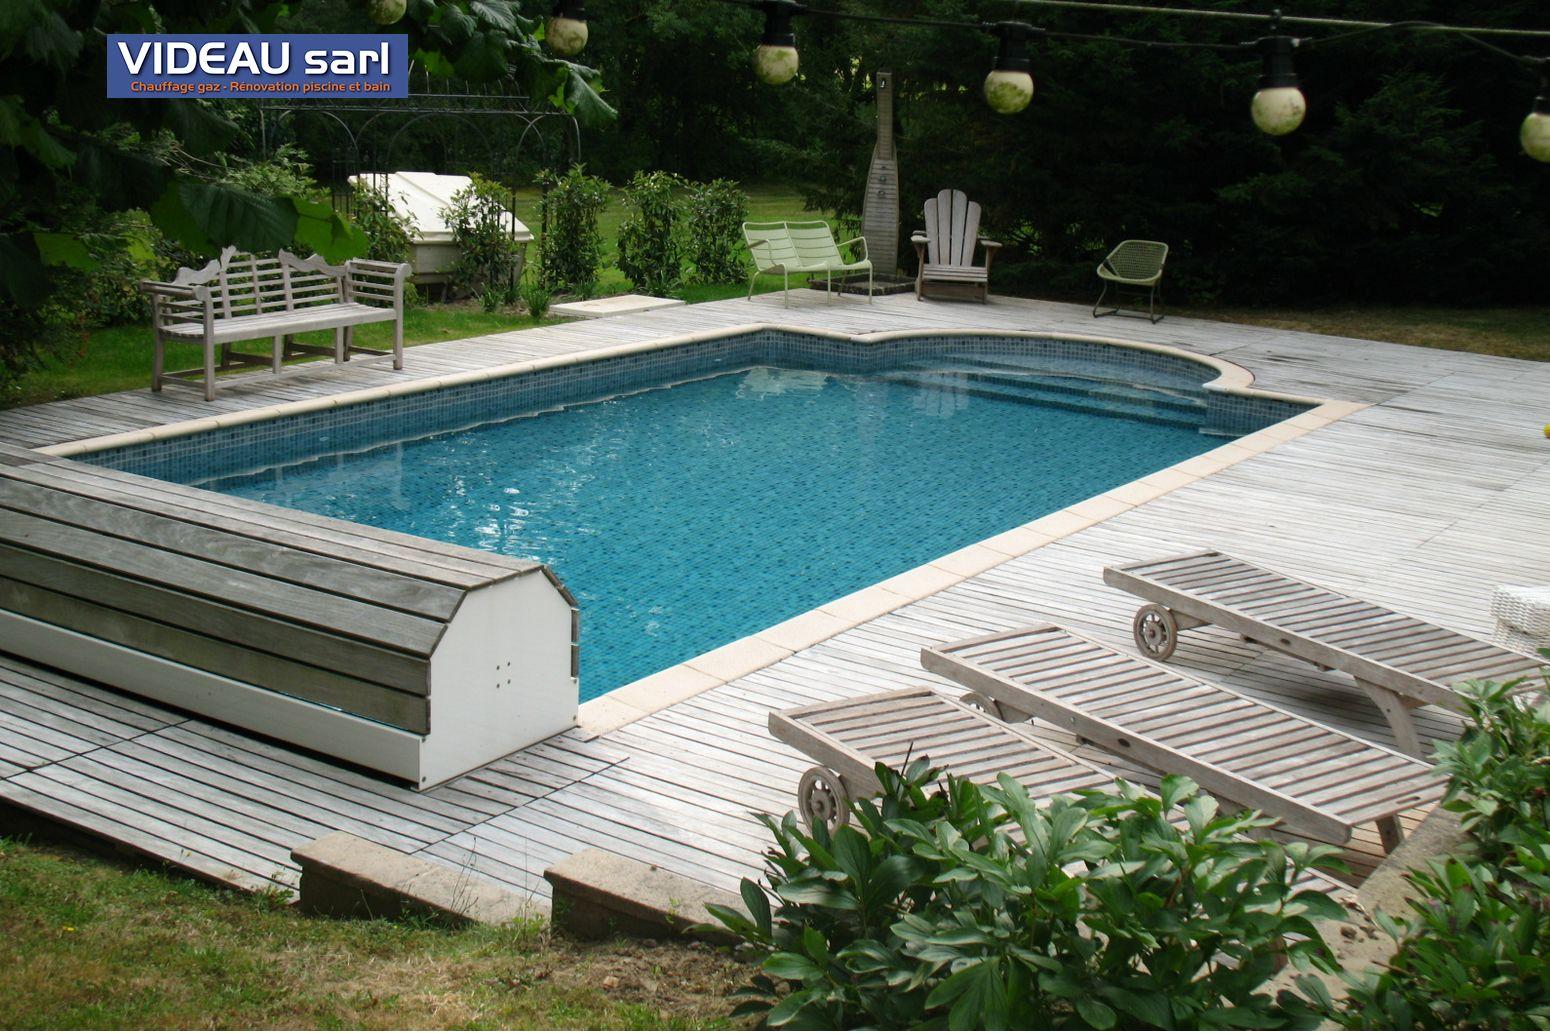 Piscine vendee entretien renovation videau for Renovation piscine